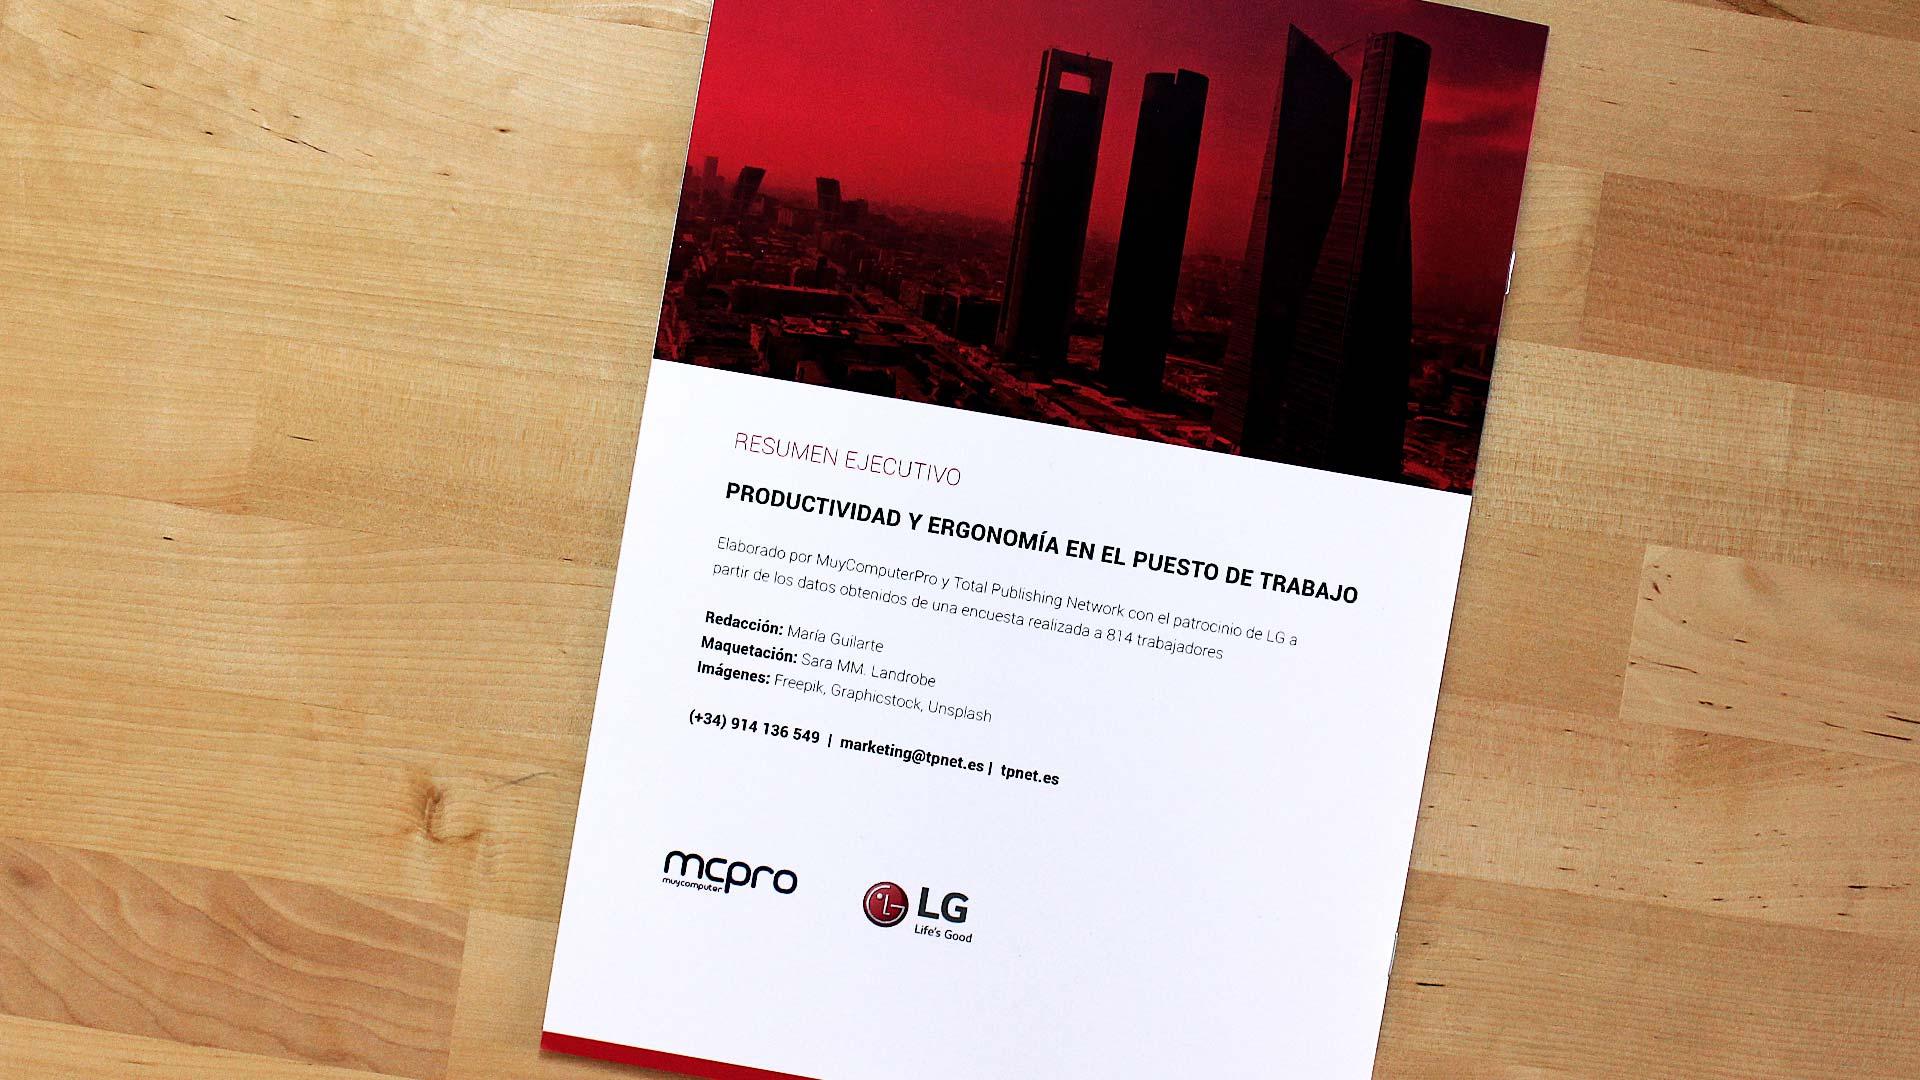 LG--content-marketing-informe-resumen-ejecutivo-ebook-ergonomia--2017_14